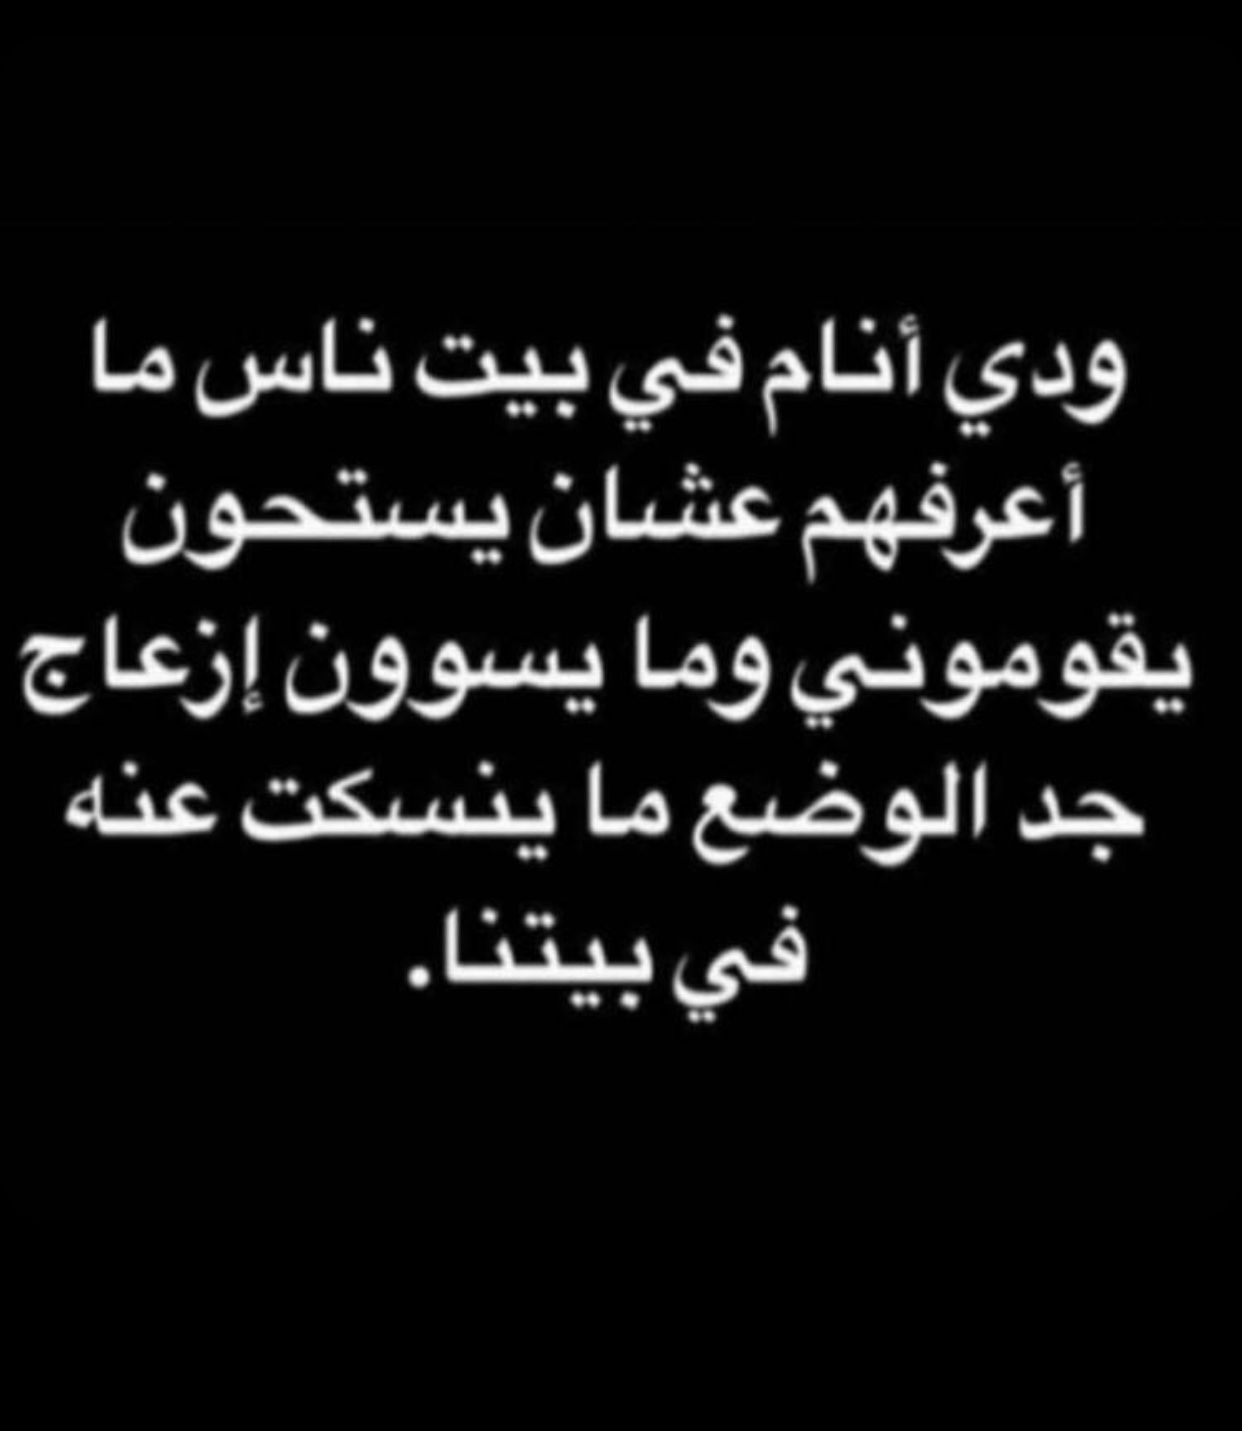 اه والله Words Quotes Funny Arabic Quotes Quran Quotes Inspirational